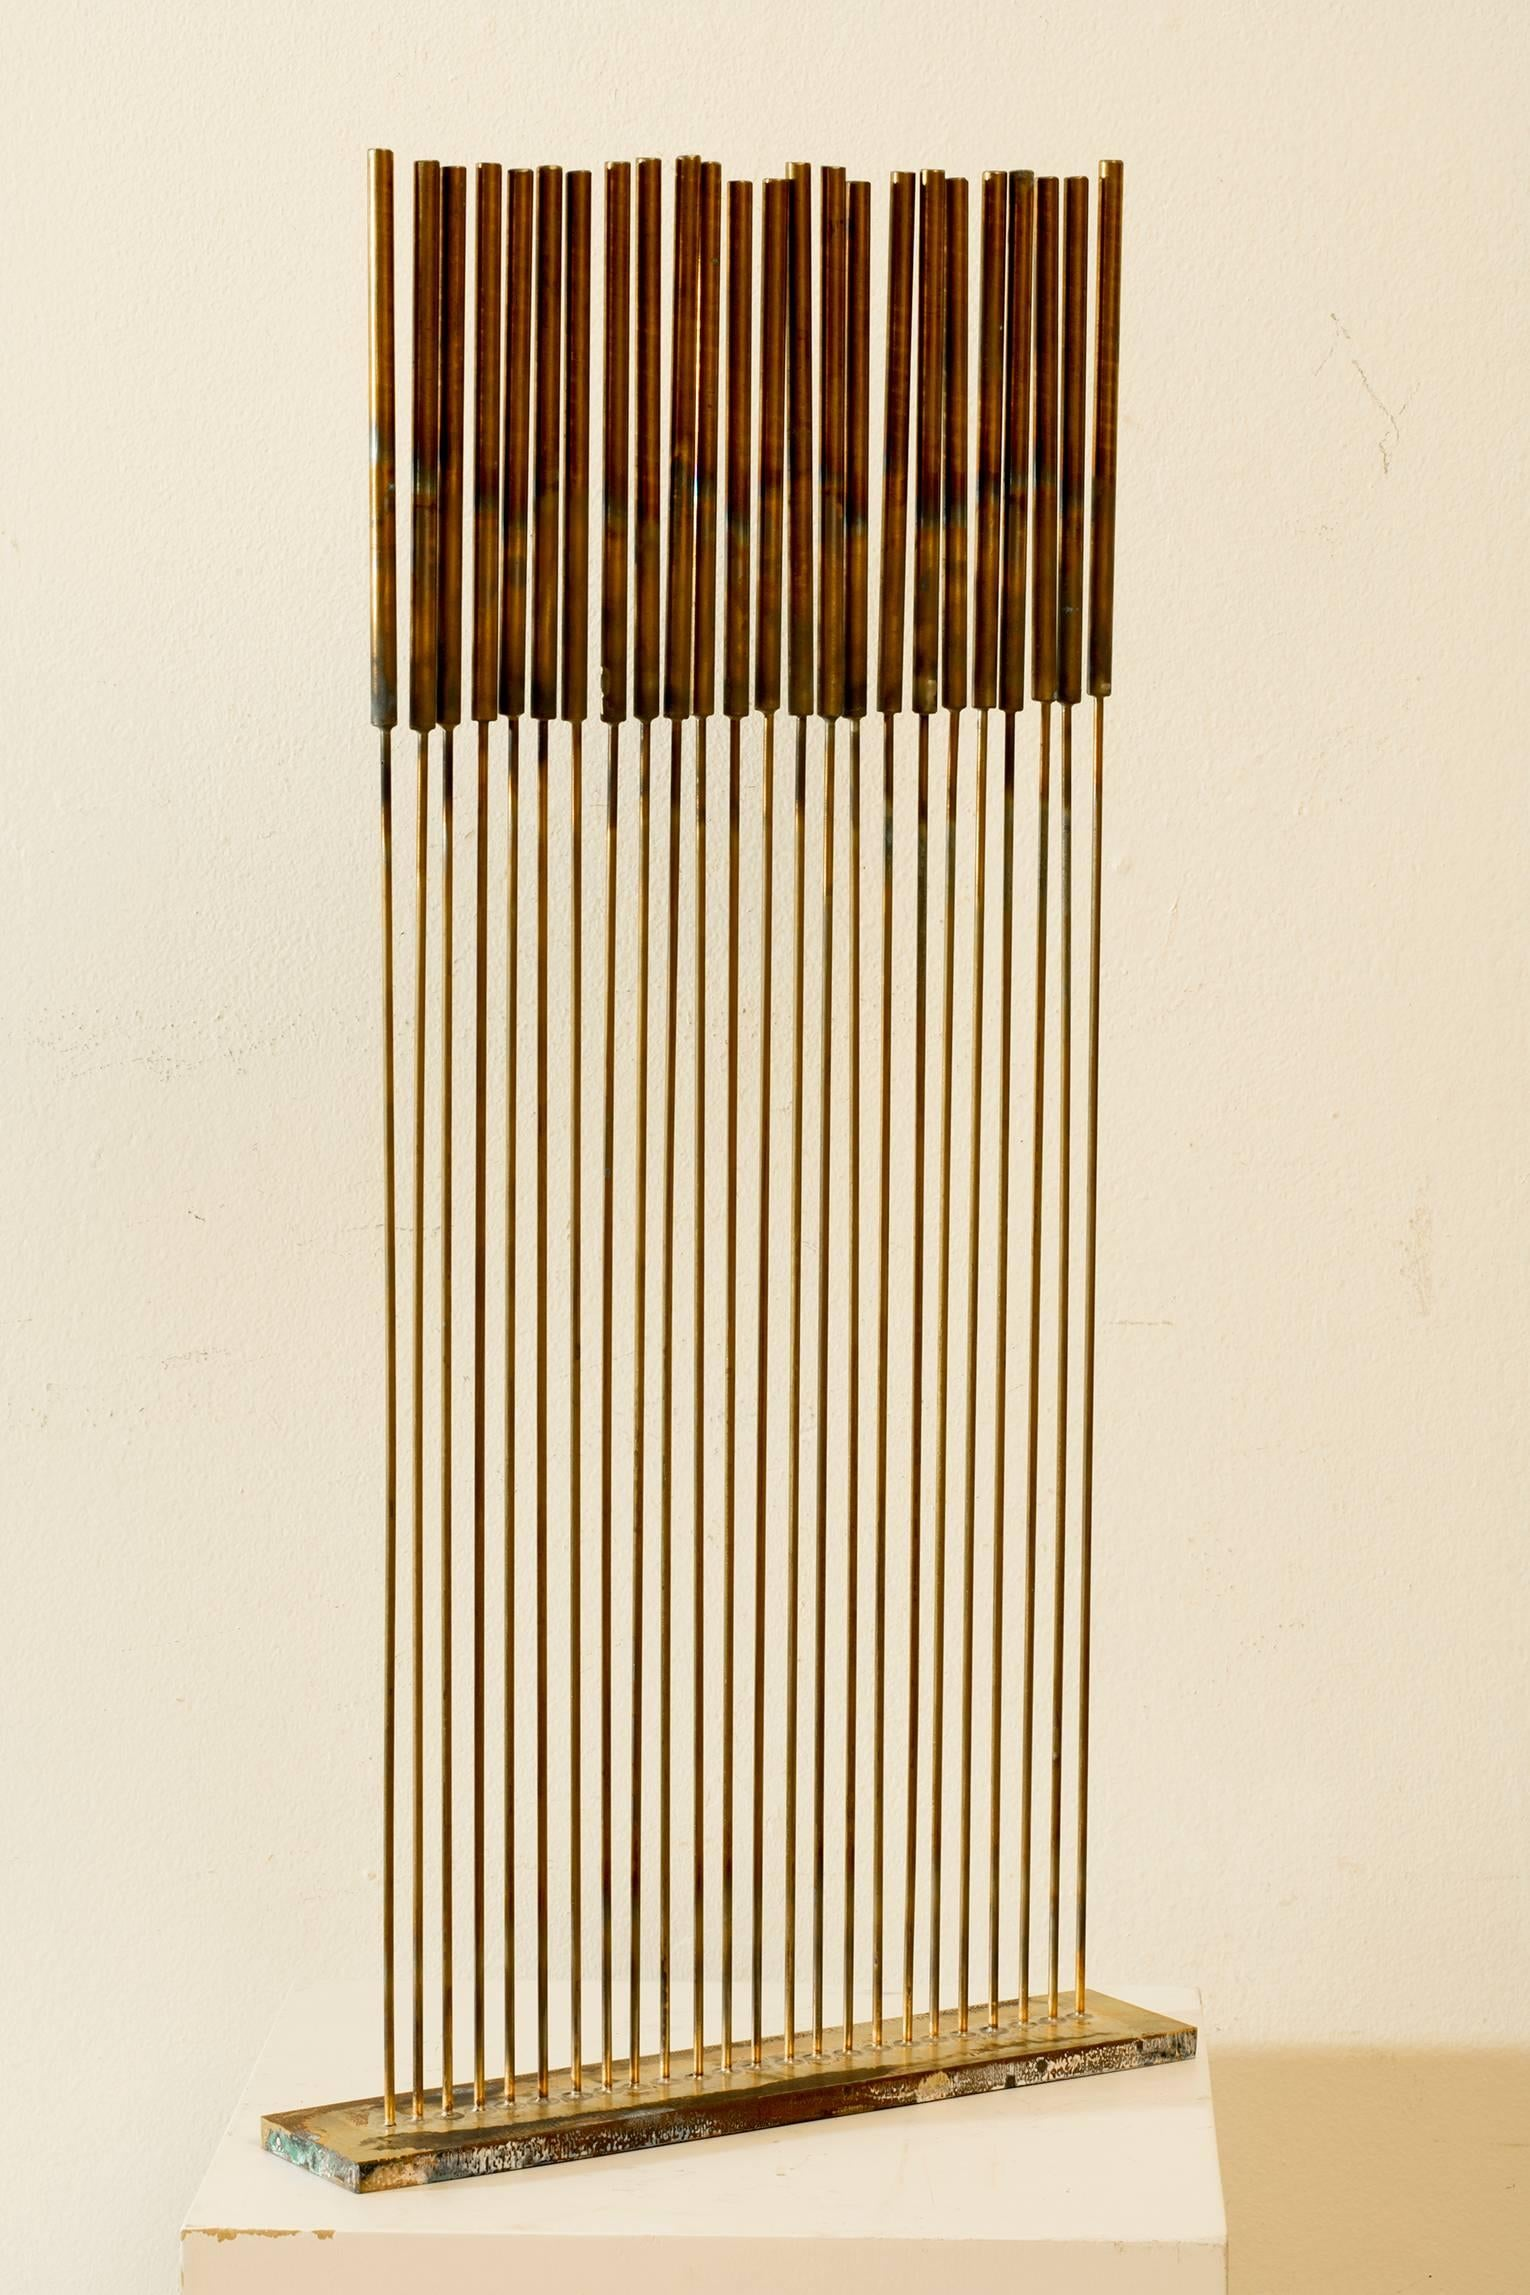 24 Cat-Tails Rods